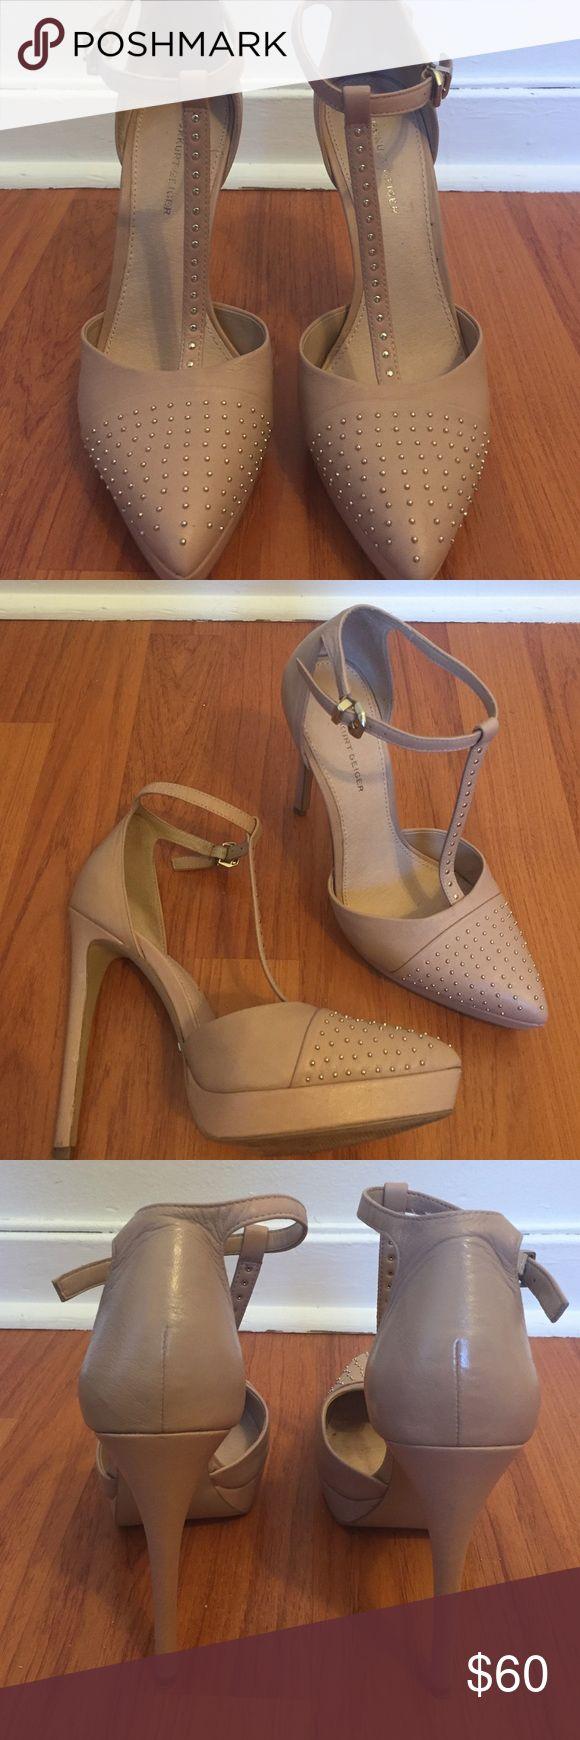 Kurt Geiger Platform Heels Very gently used. 1' platform. 4' total height. Narrow in the toe box Kurt Geiger Shoes Heels